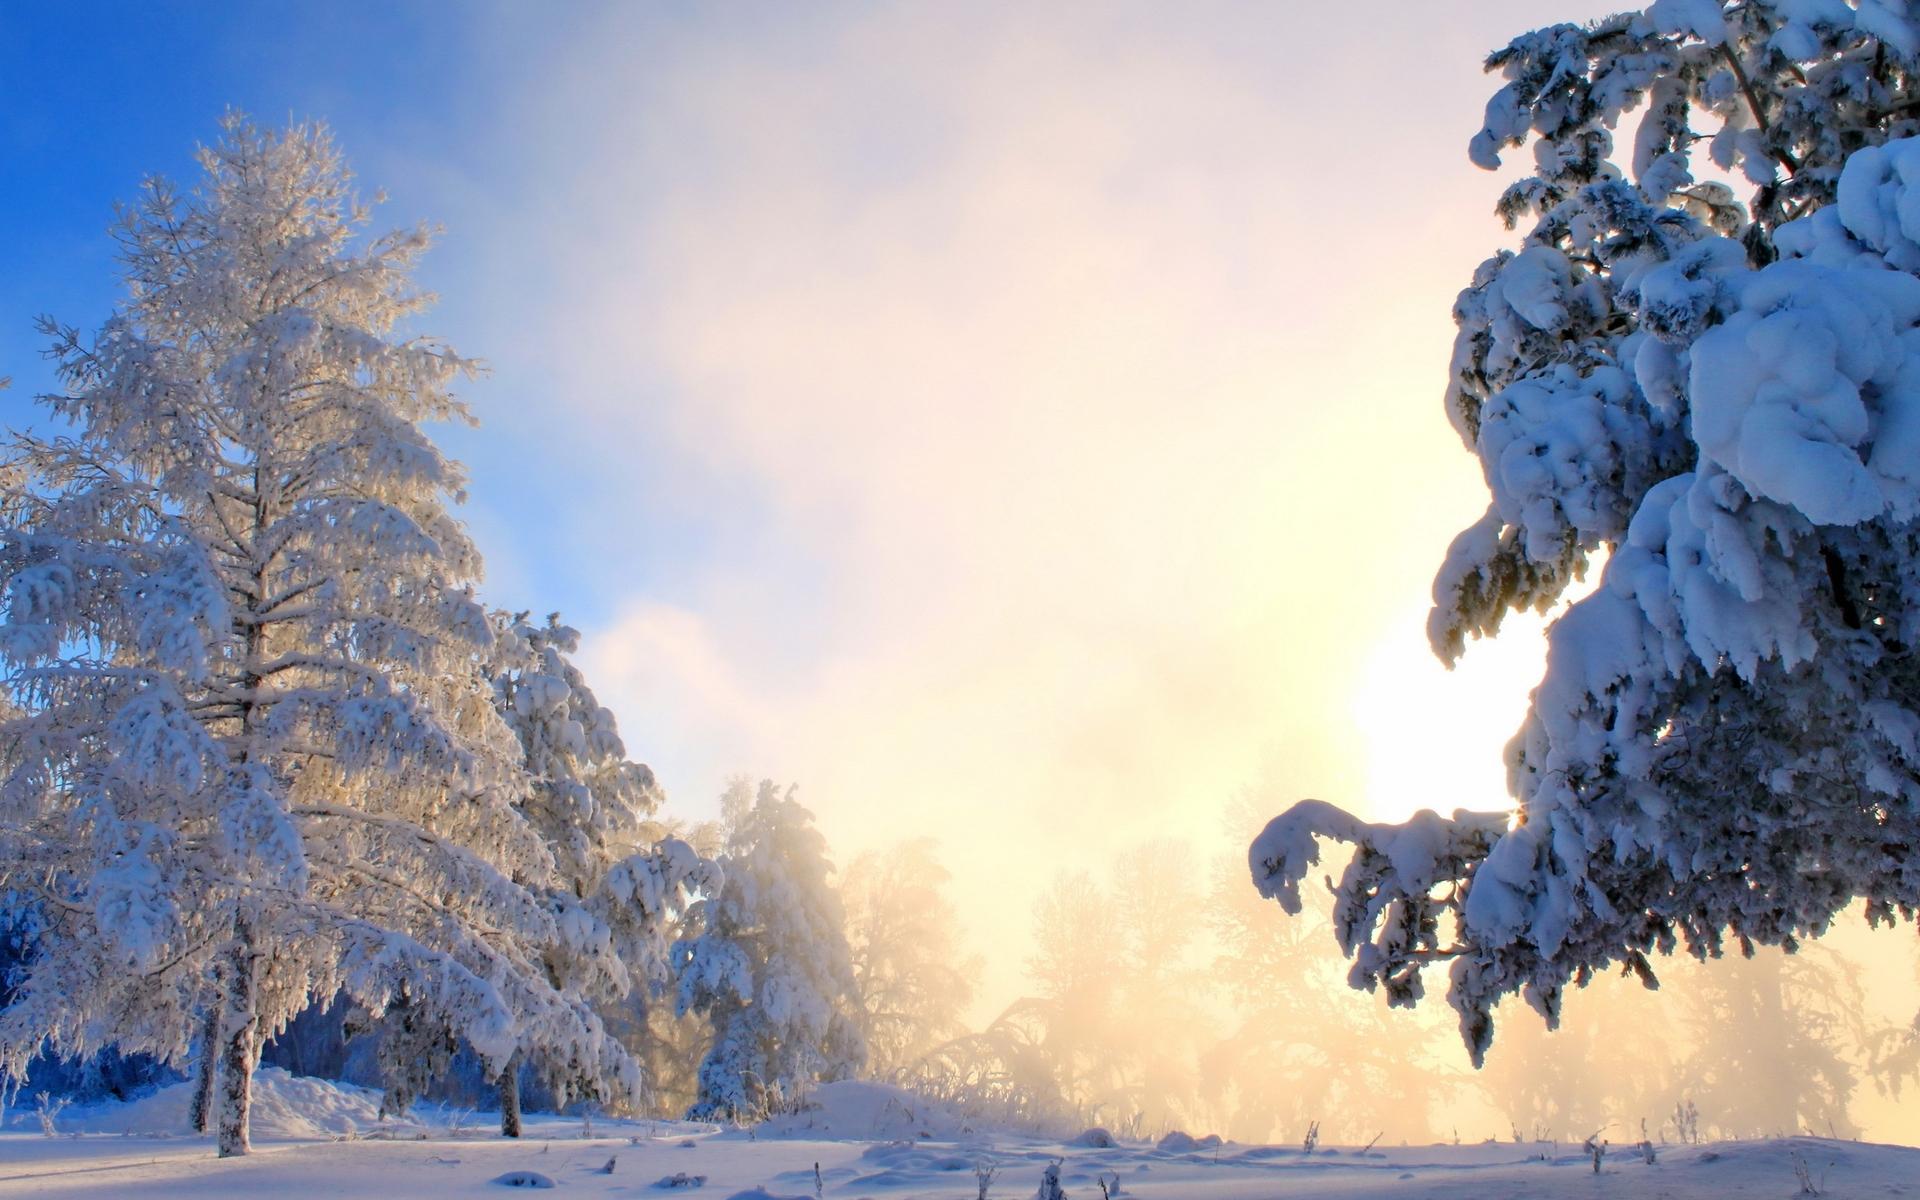 Snowy pine trees wallpaper 27944 1920x1200